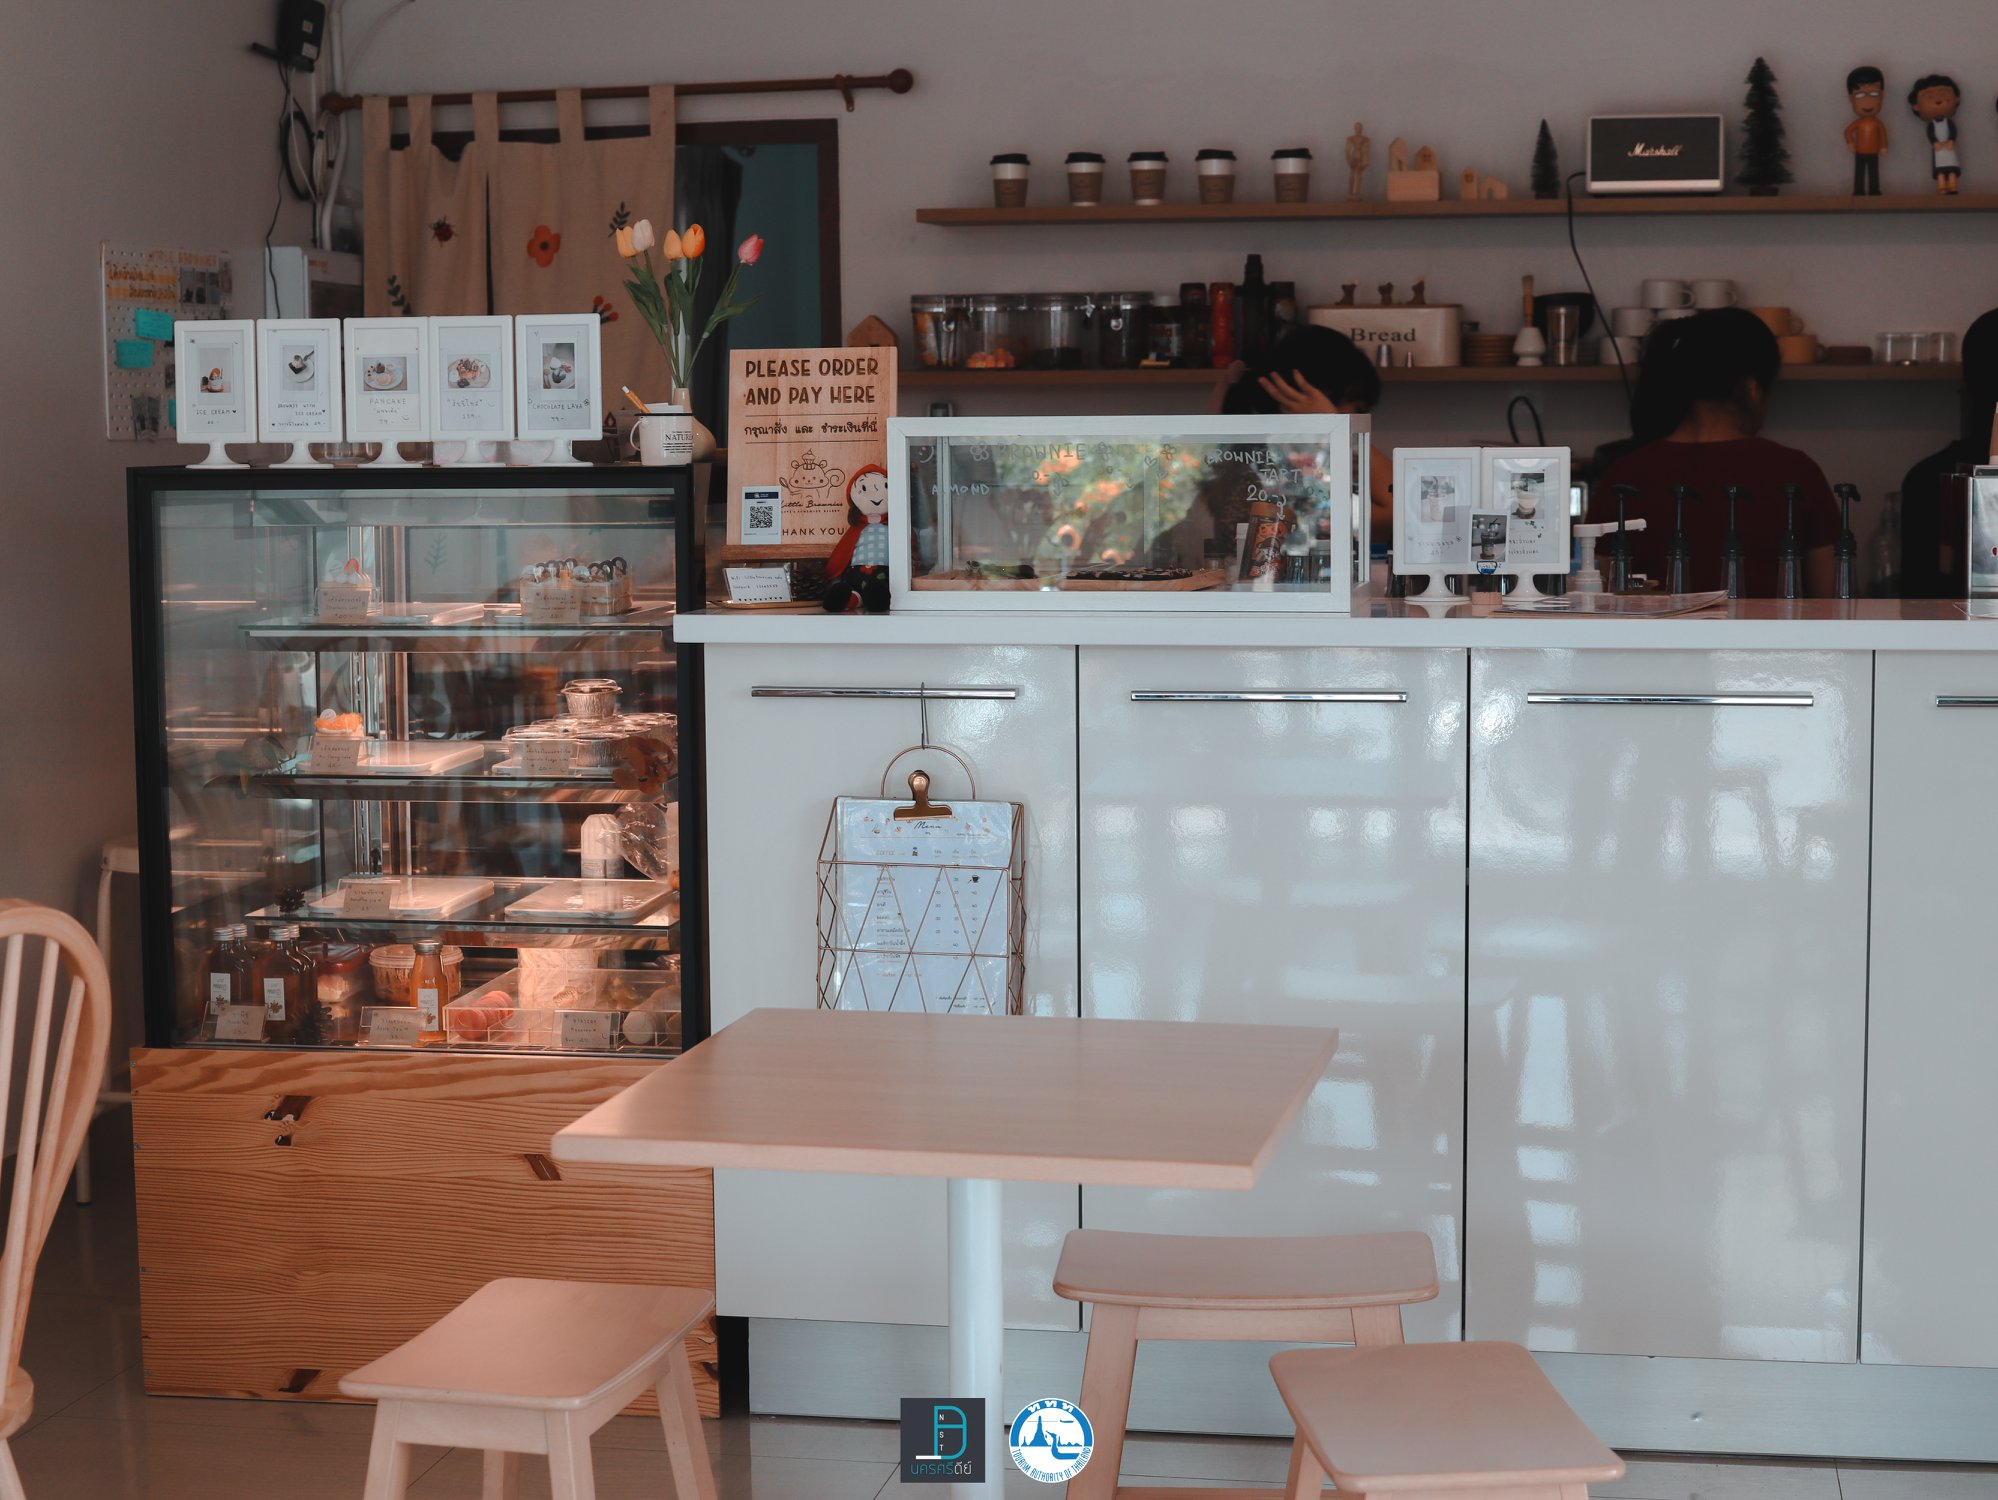 1. Little Brownies เริ่มกันเลยกับร้านแรกของเรา เป็นคาเฟ่โทนสีขาวน่ารักๆ ชื่อร้าน ลิตเติ้ล บราวนี่ คือบราวนี่อร่อยมวากกกก เมนูน้ำก็เด็ด แอดชิมโกโก้มัจฉะ คือเอาไปเลย 10/10 ทั้งเบเกอรี่และเครื่องดื่มครับ ร้านบรรยากาศดีนั่งสบายเน้ออ สงบ มีน้องๆมานั่งอ่านหนังสือติวกันเยอะครับคาเฟ่,สตูล,เด็ด,จุดเช็คอิน,อร่อย,ร้านอาหาร,จุดถ่ายรูป,สถานที่ท่องเที่ยว